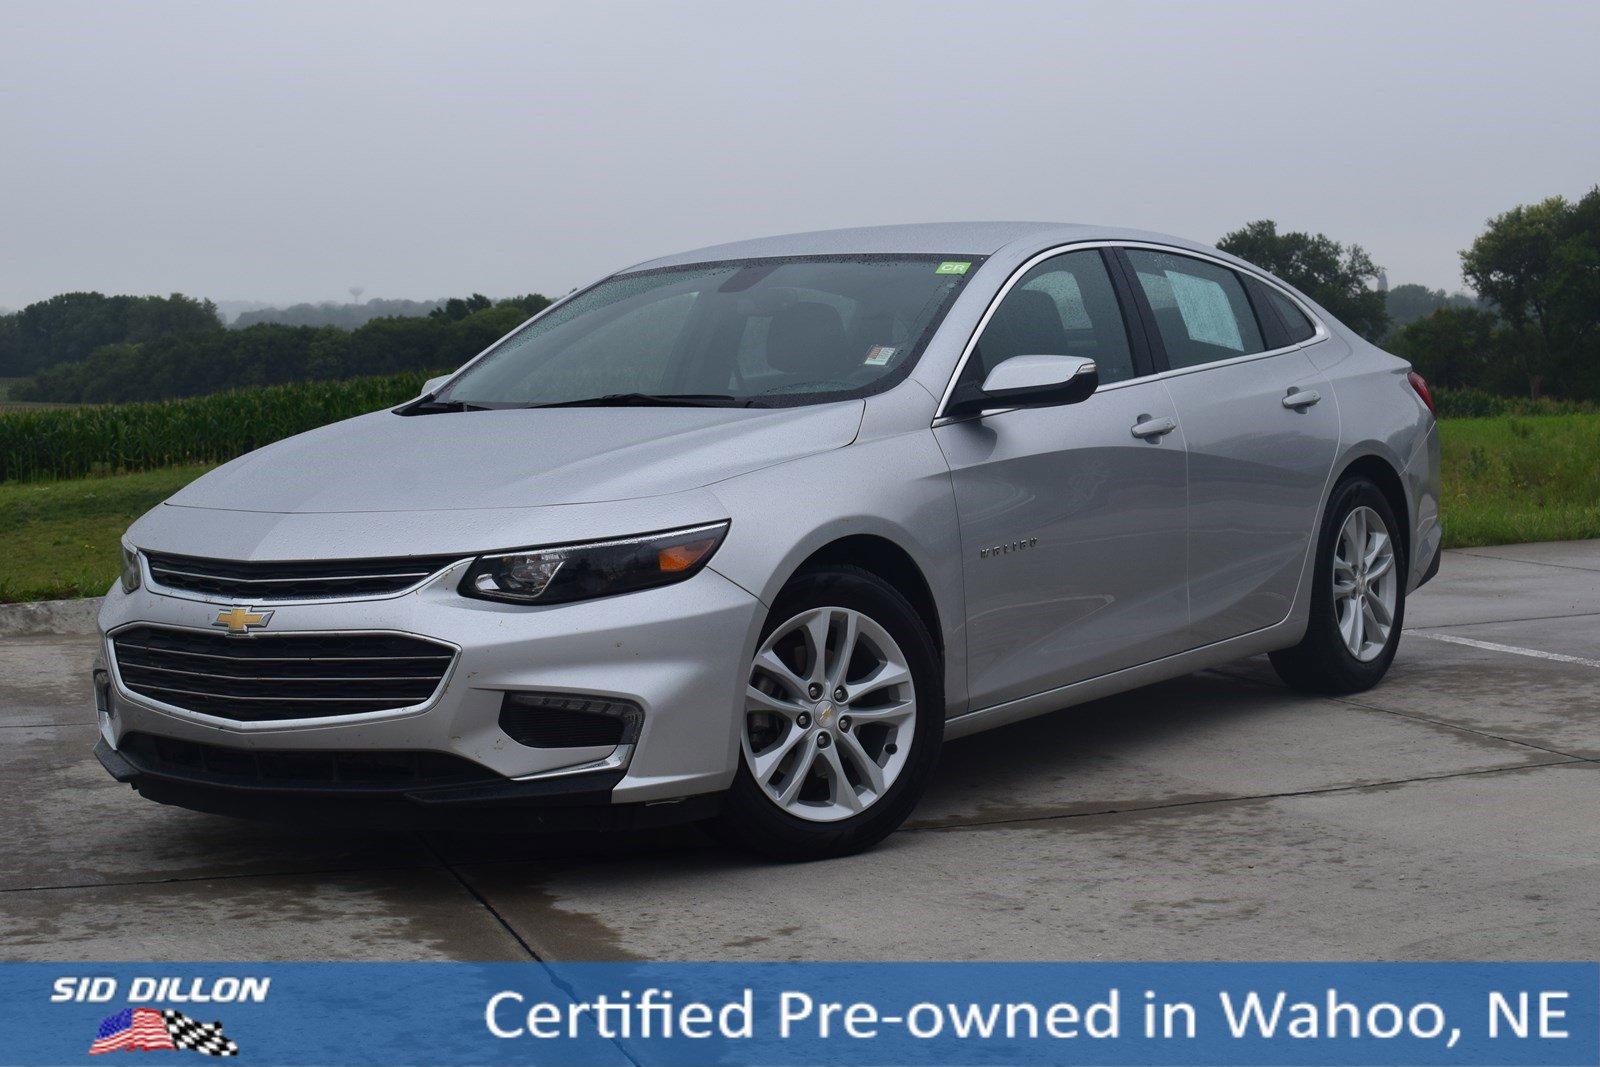 Certified Pre-Owned 2016 Chevrolet Malibu LT